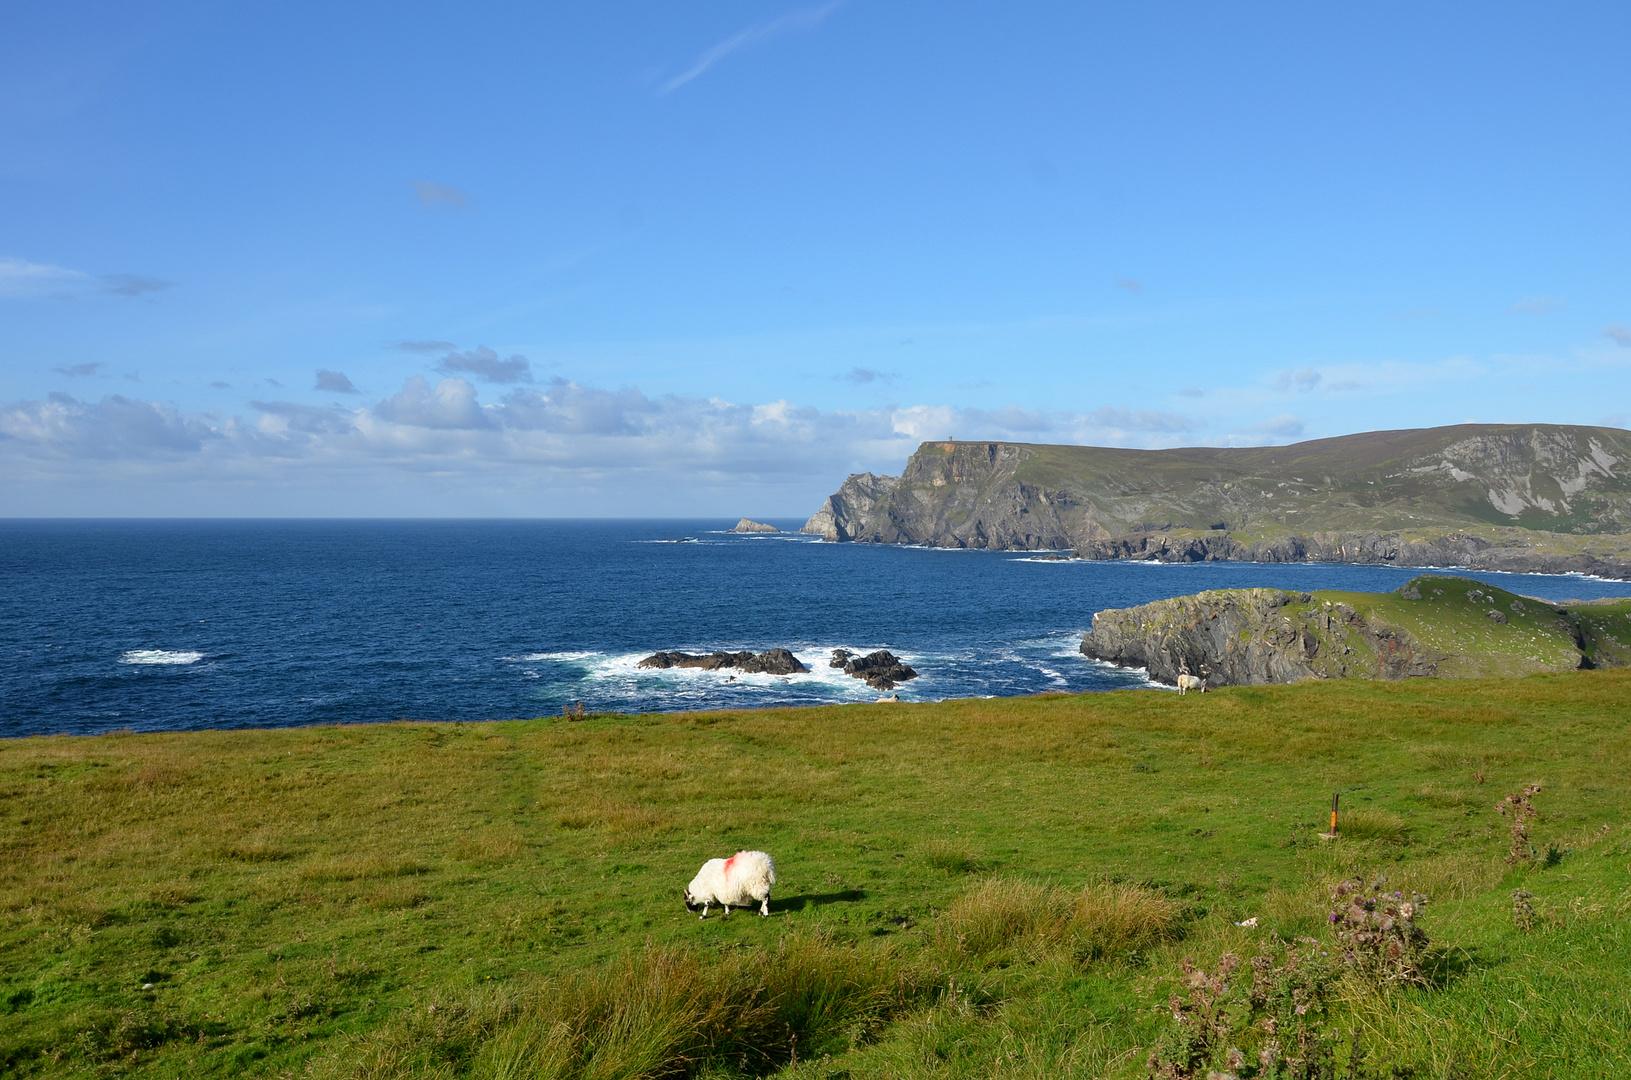 Sommerabendstimmung in County Donegal - Ireland